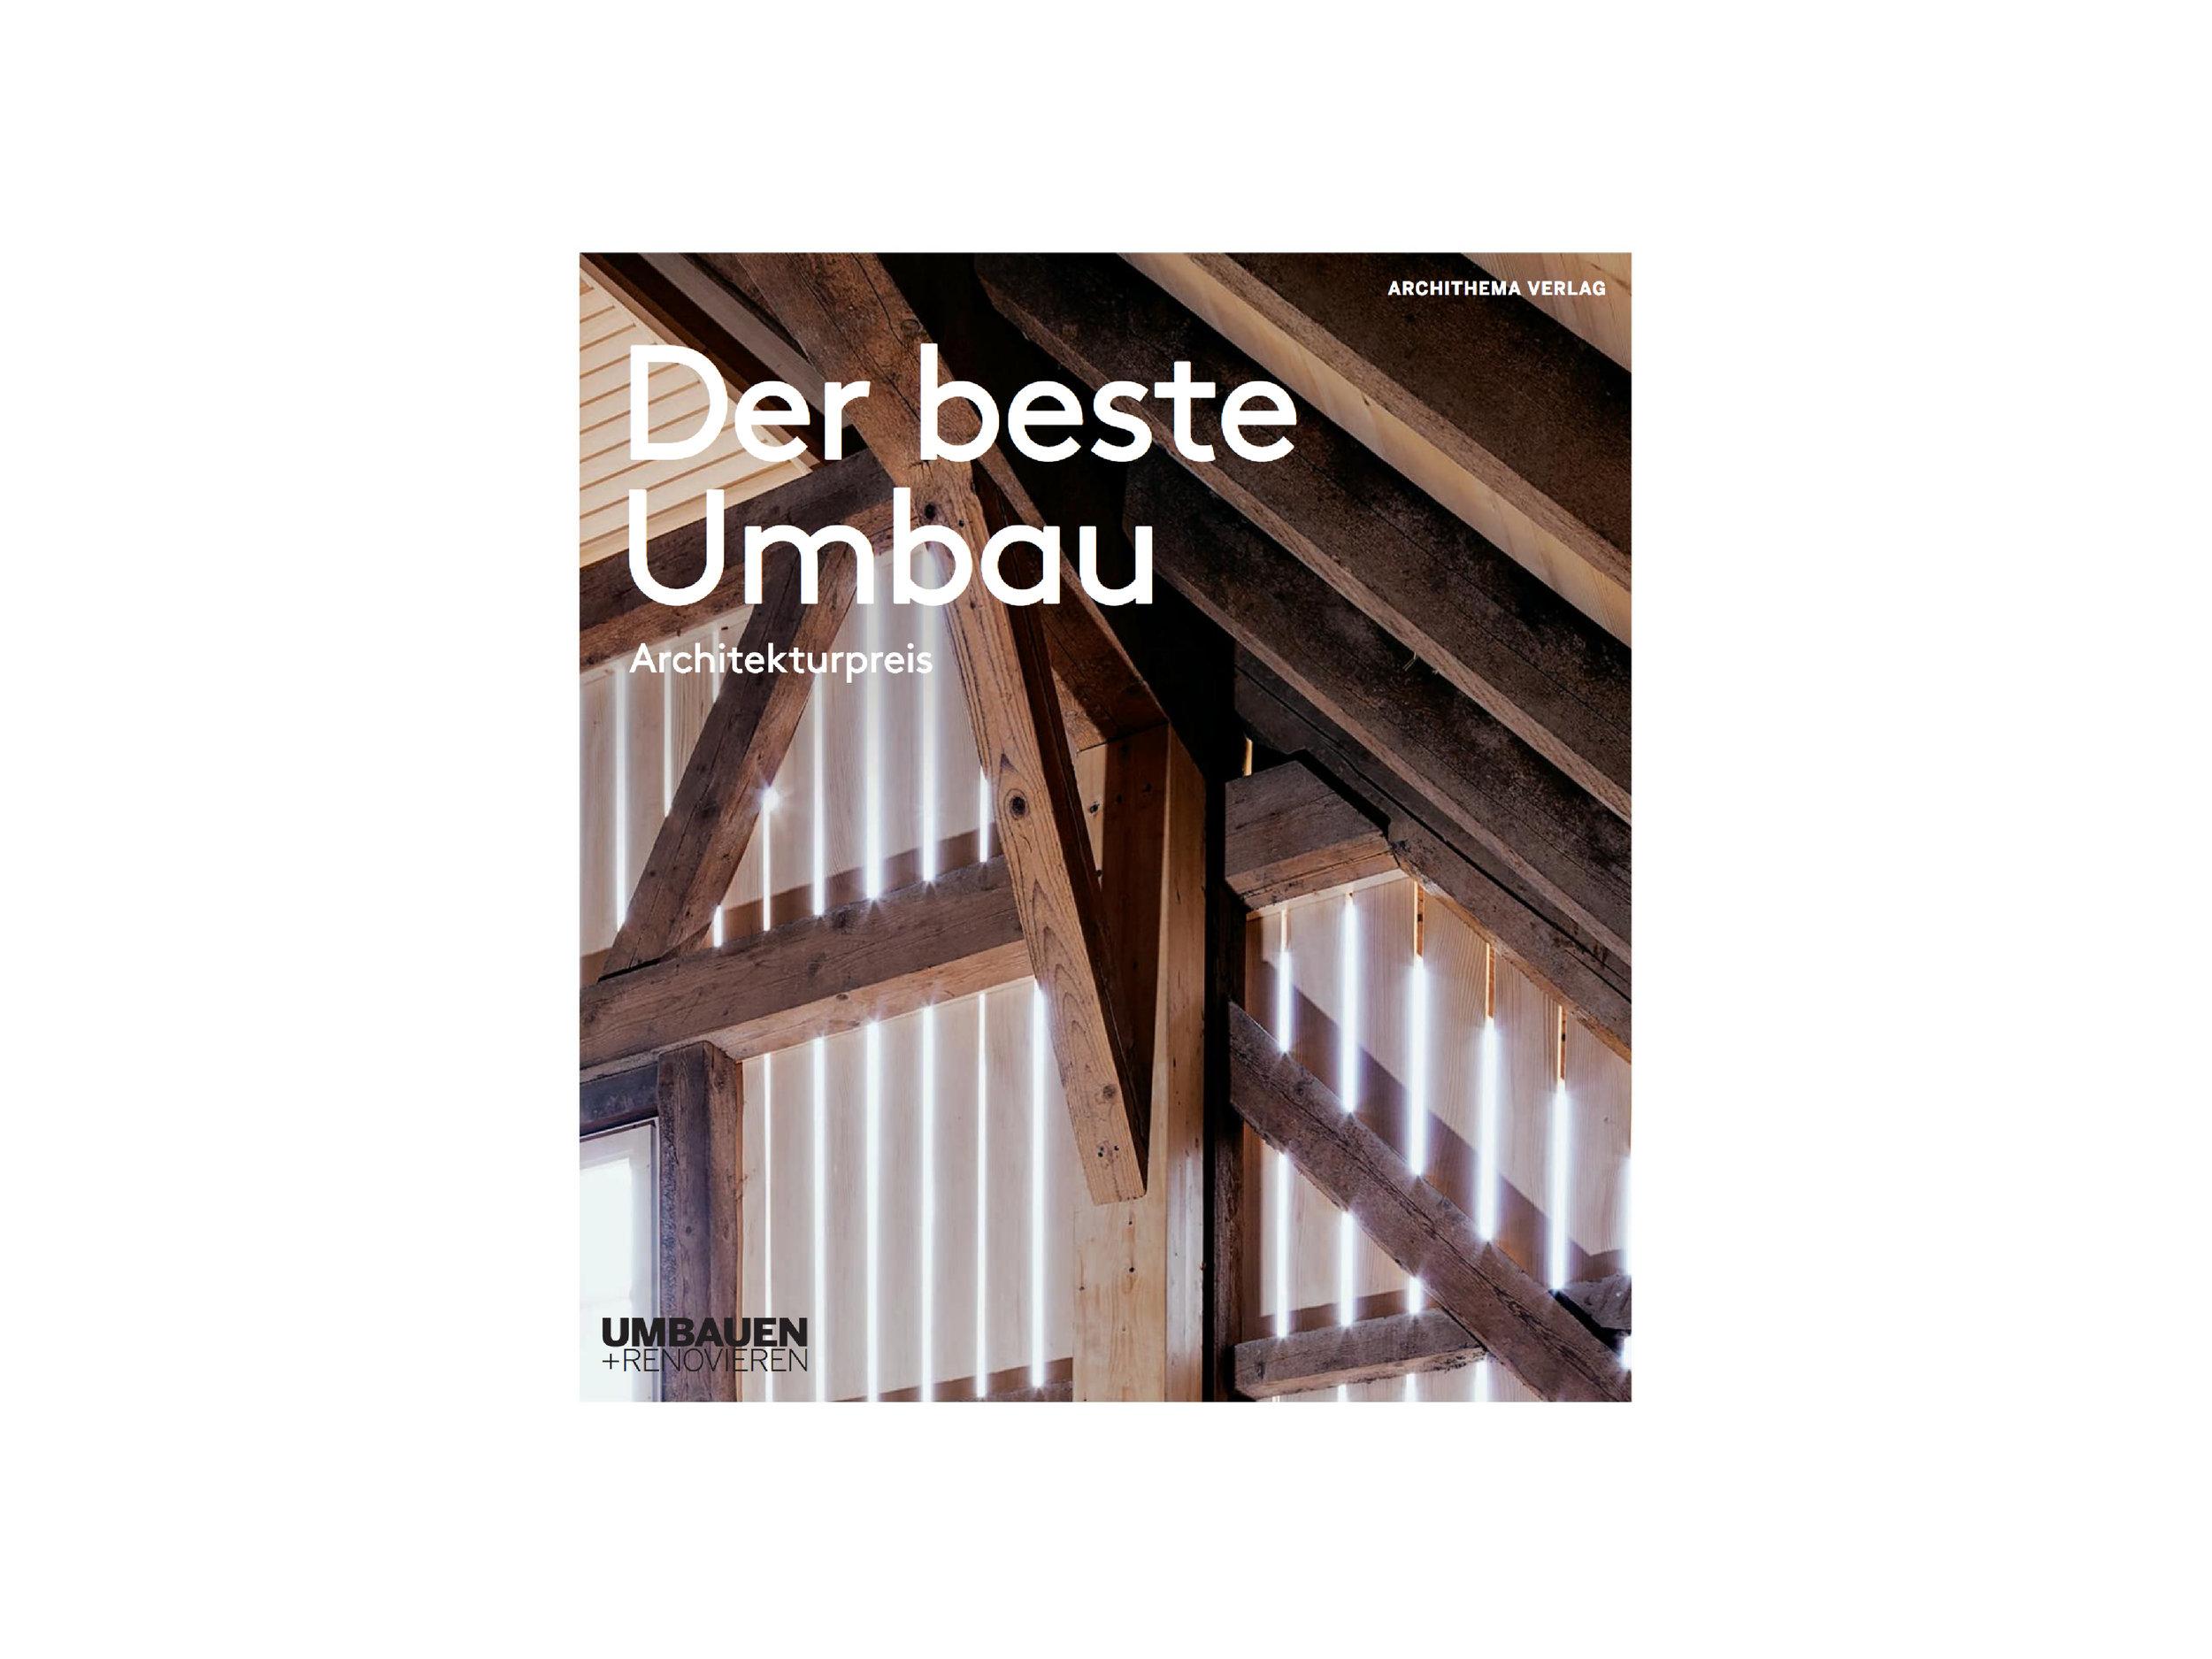 Index - Der beste Umbau 2018.jpg